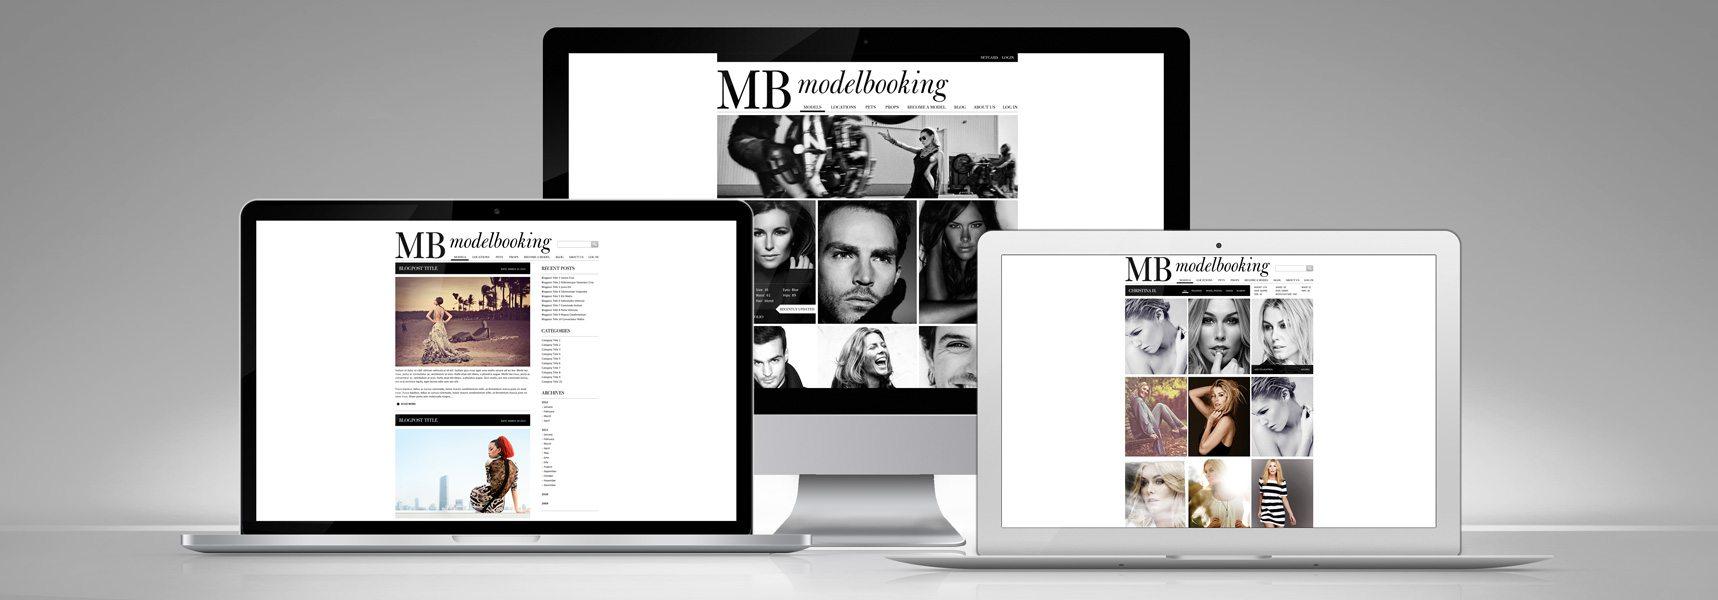 modelbooking.dk